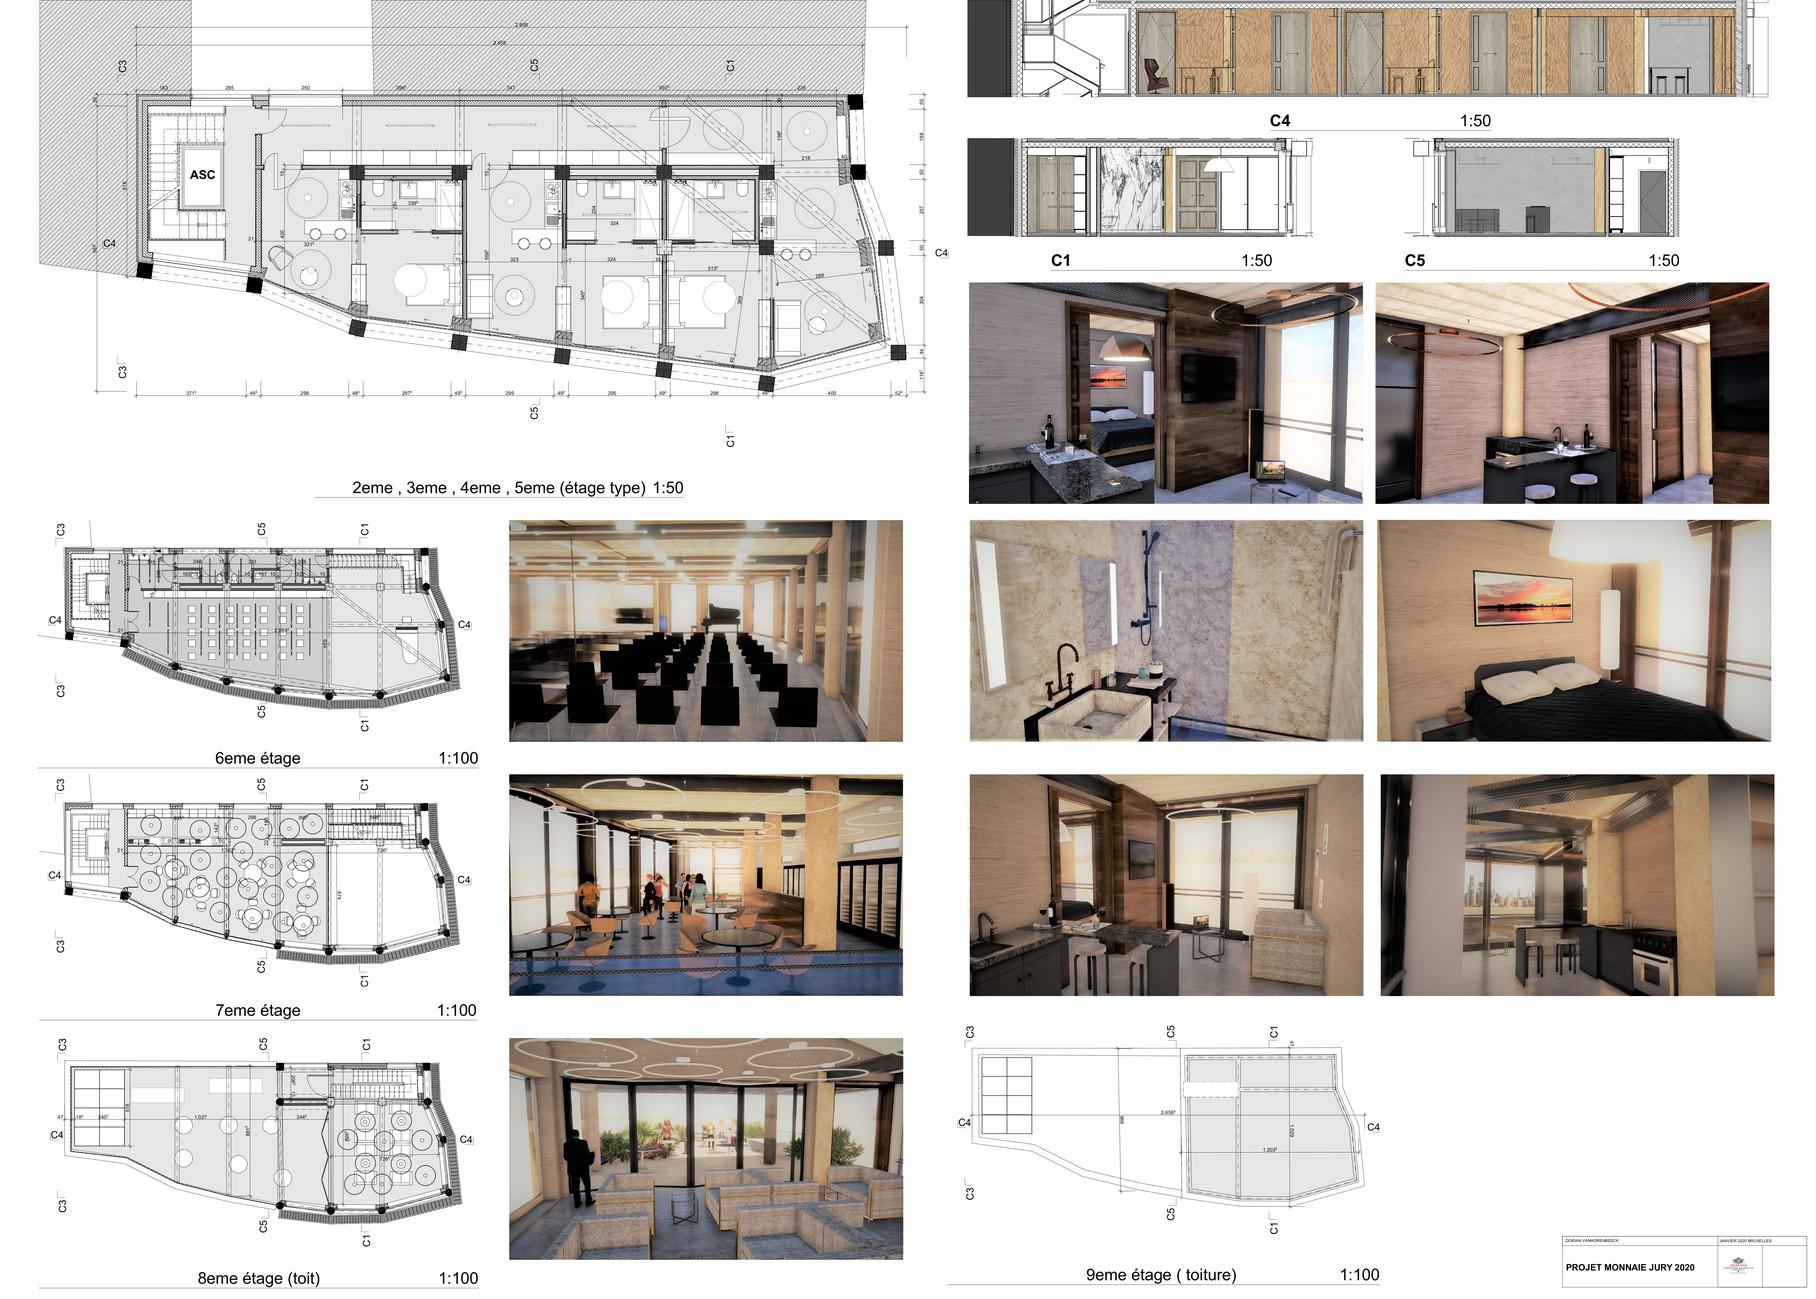 DORIAN-Jury-janvier_FINIpdf-1-_page-0001-ConvertImage